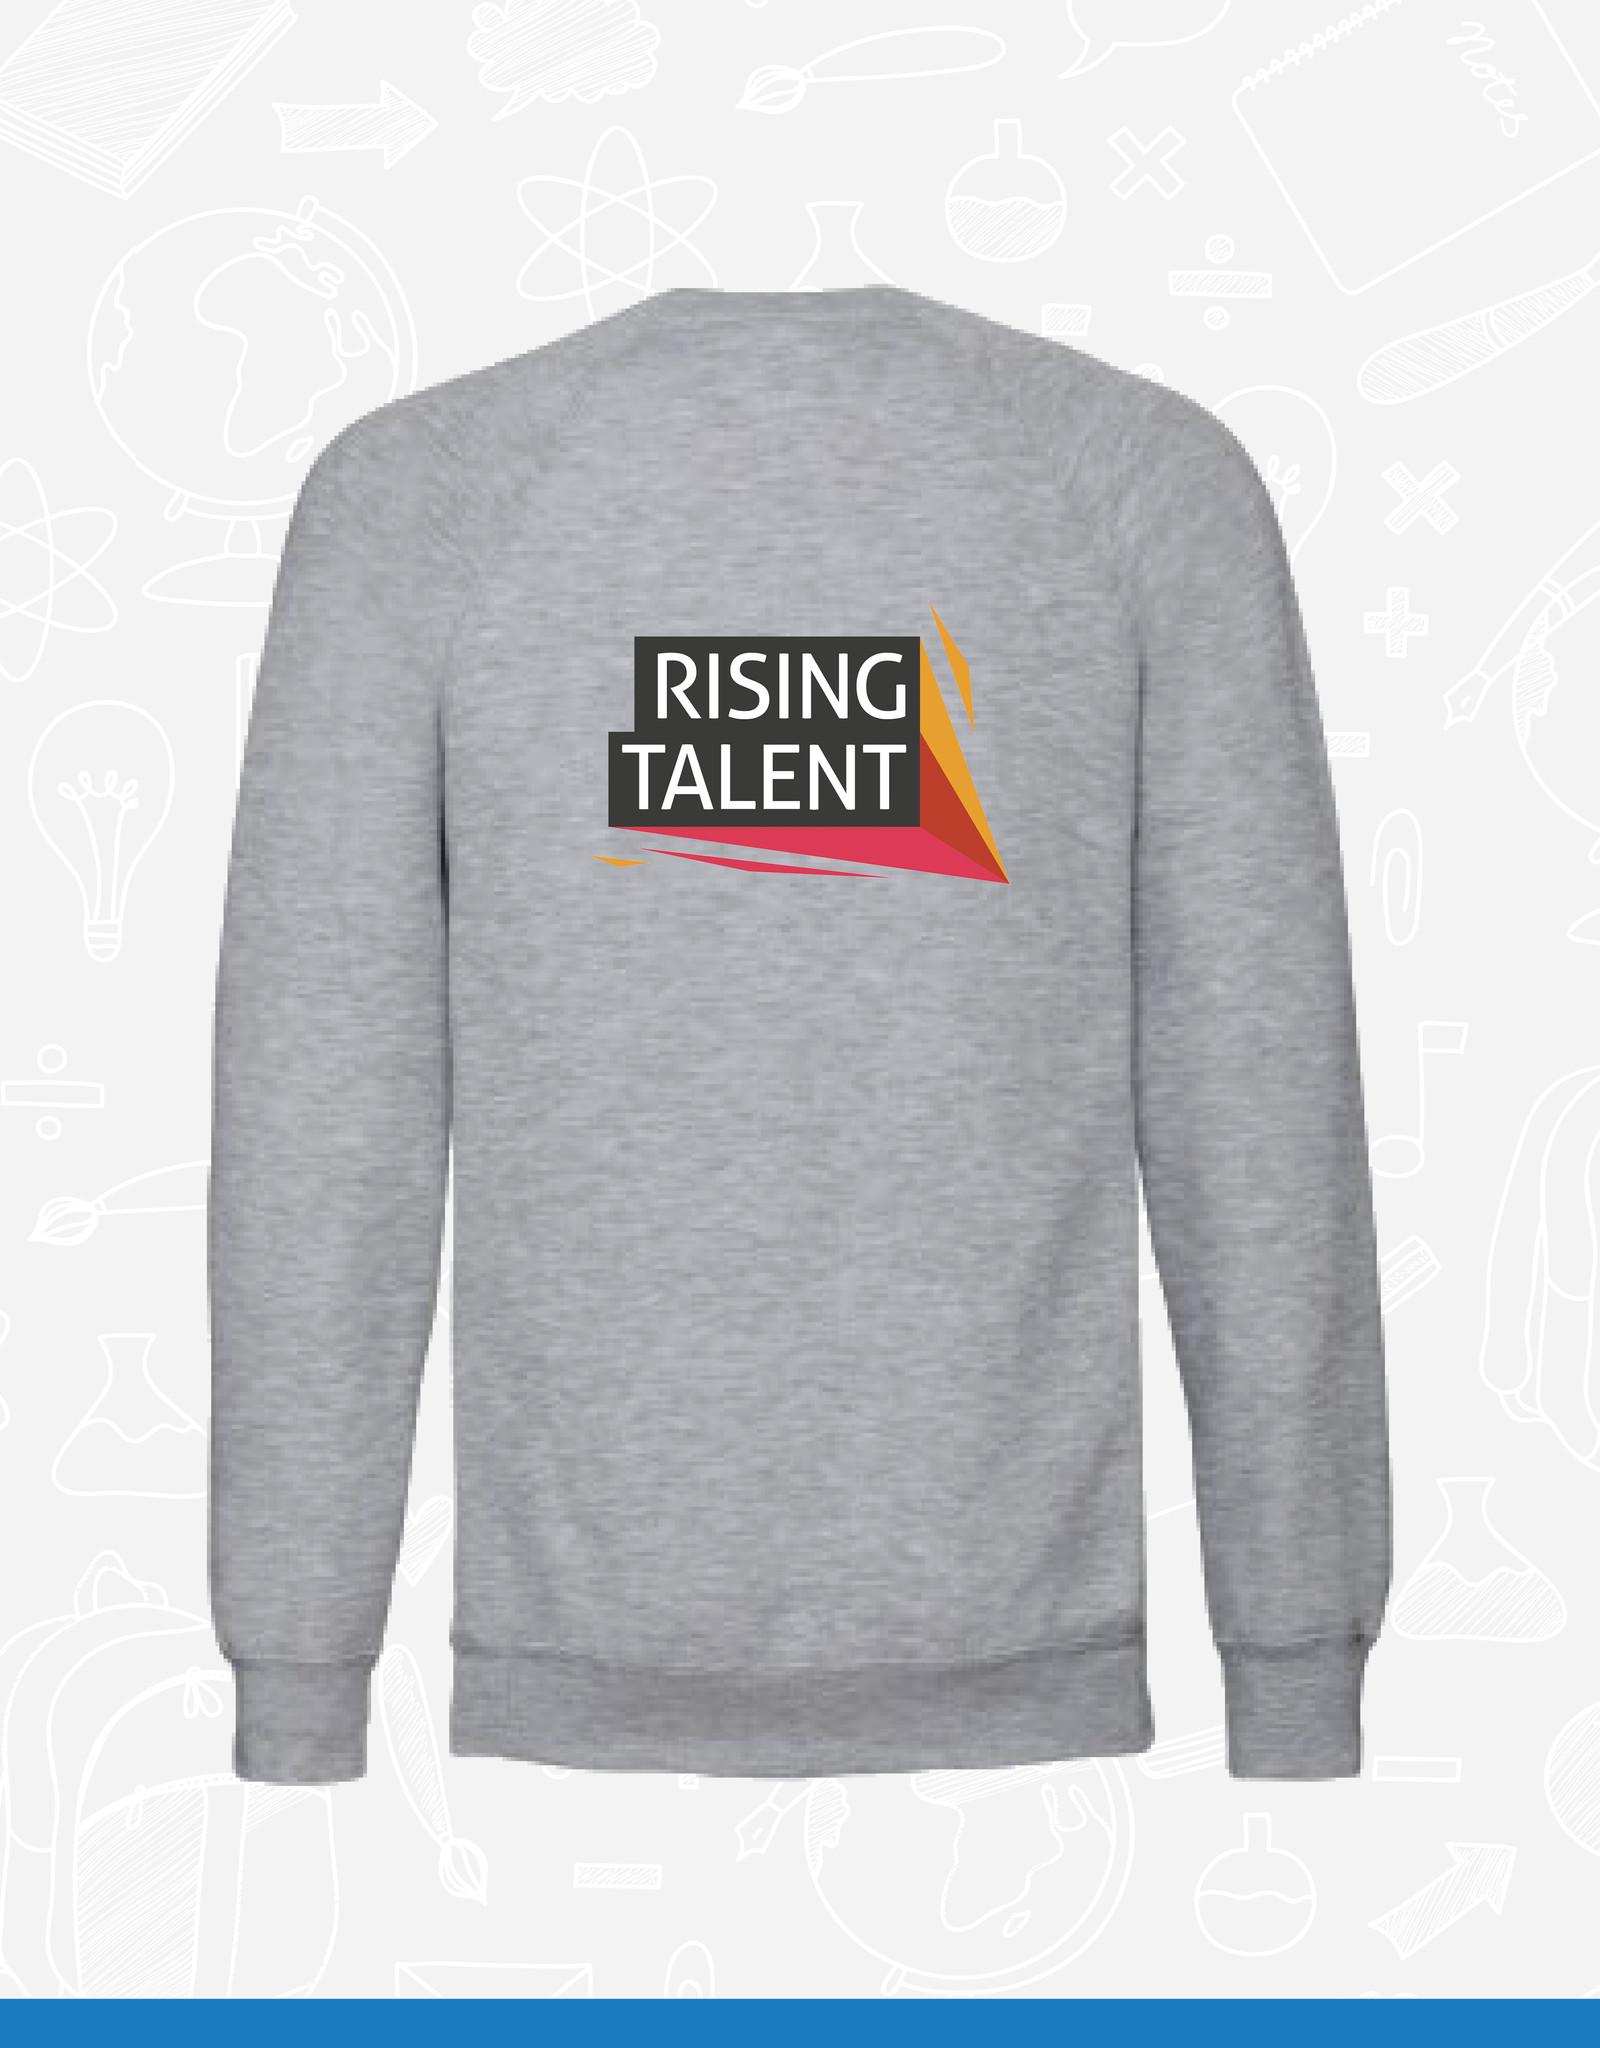 Russell Rising Talent Sweatshirt (762M)